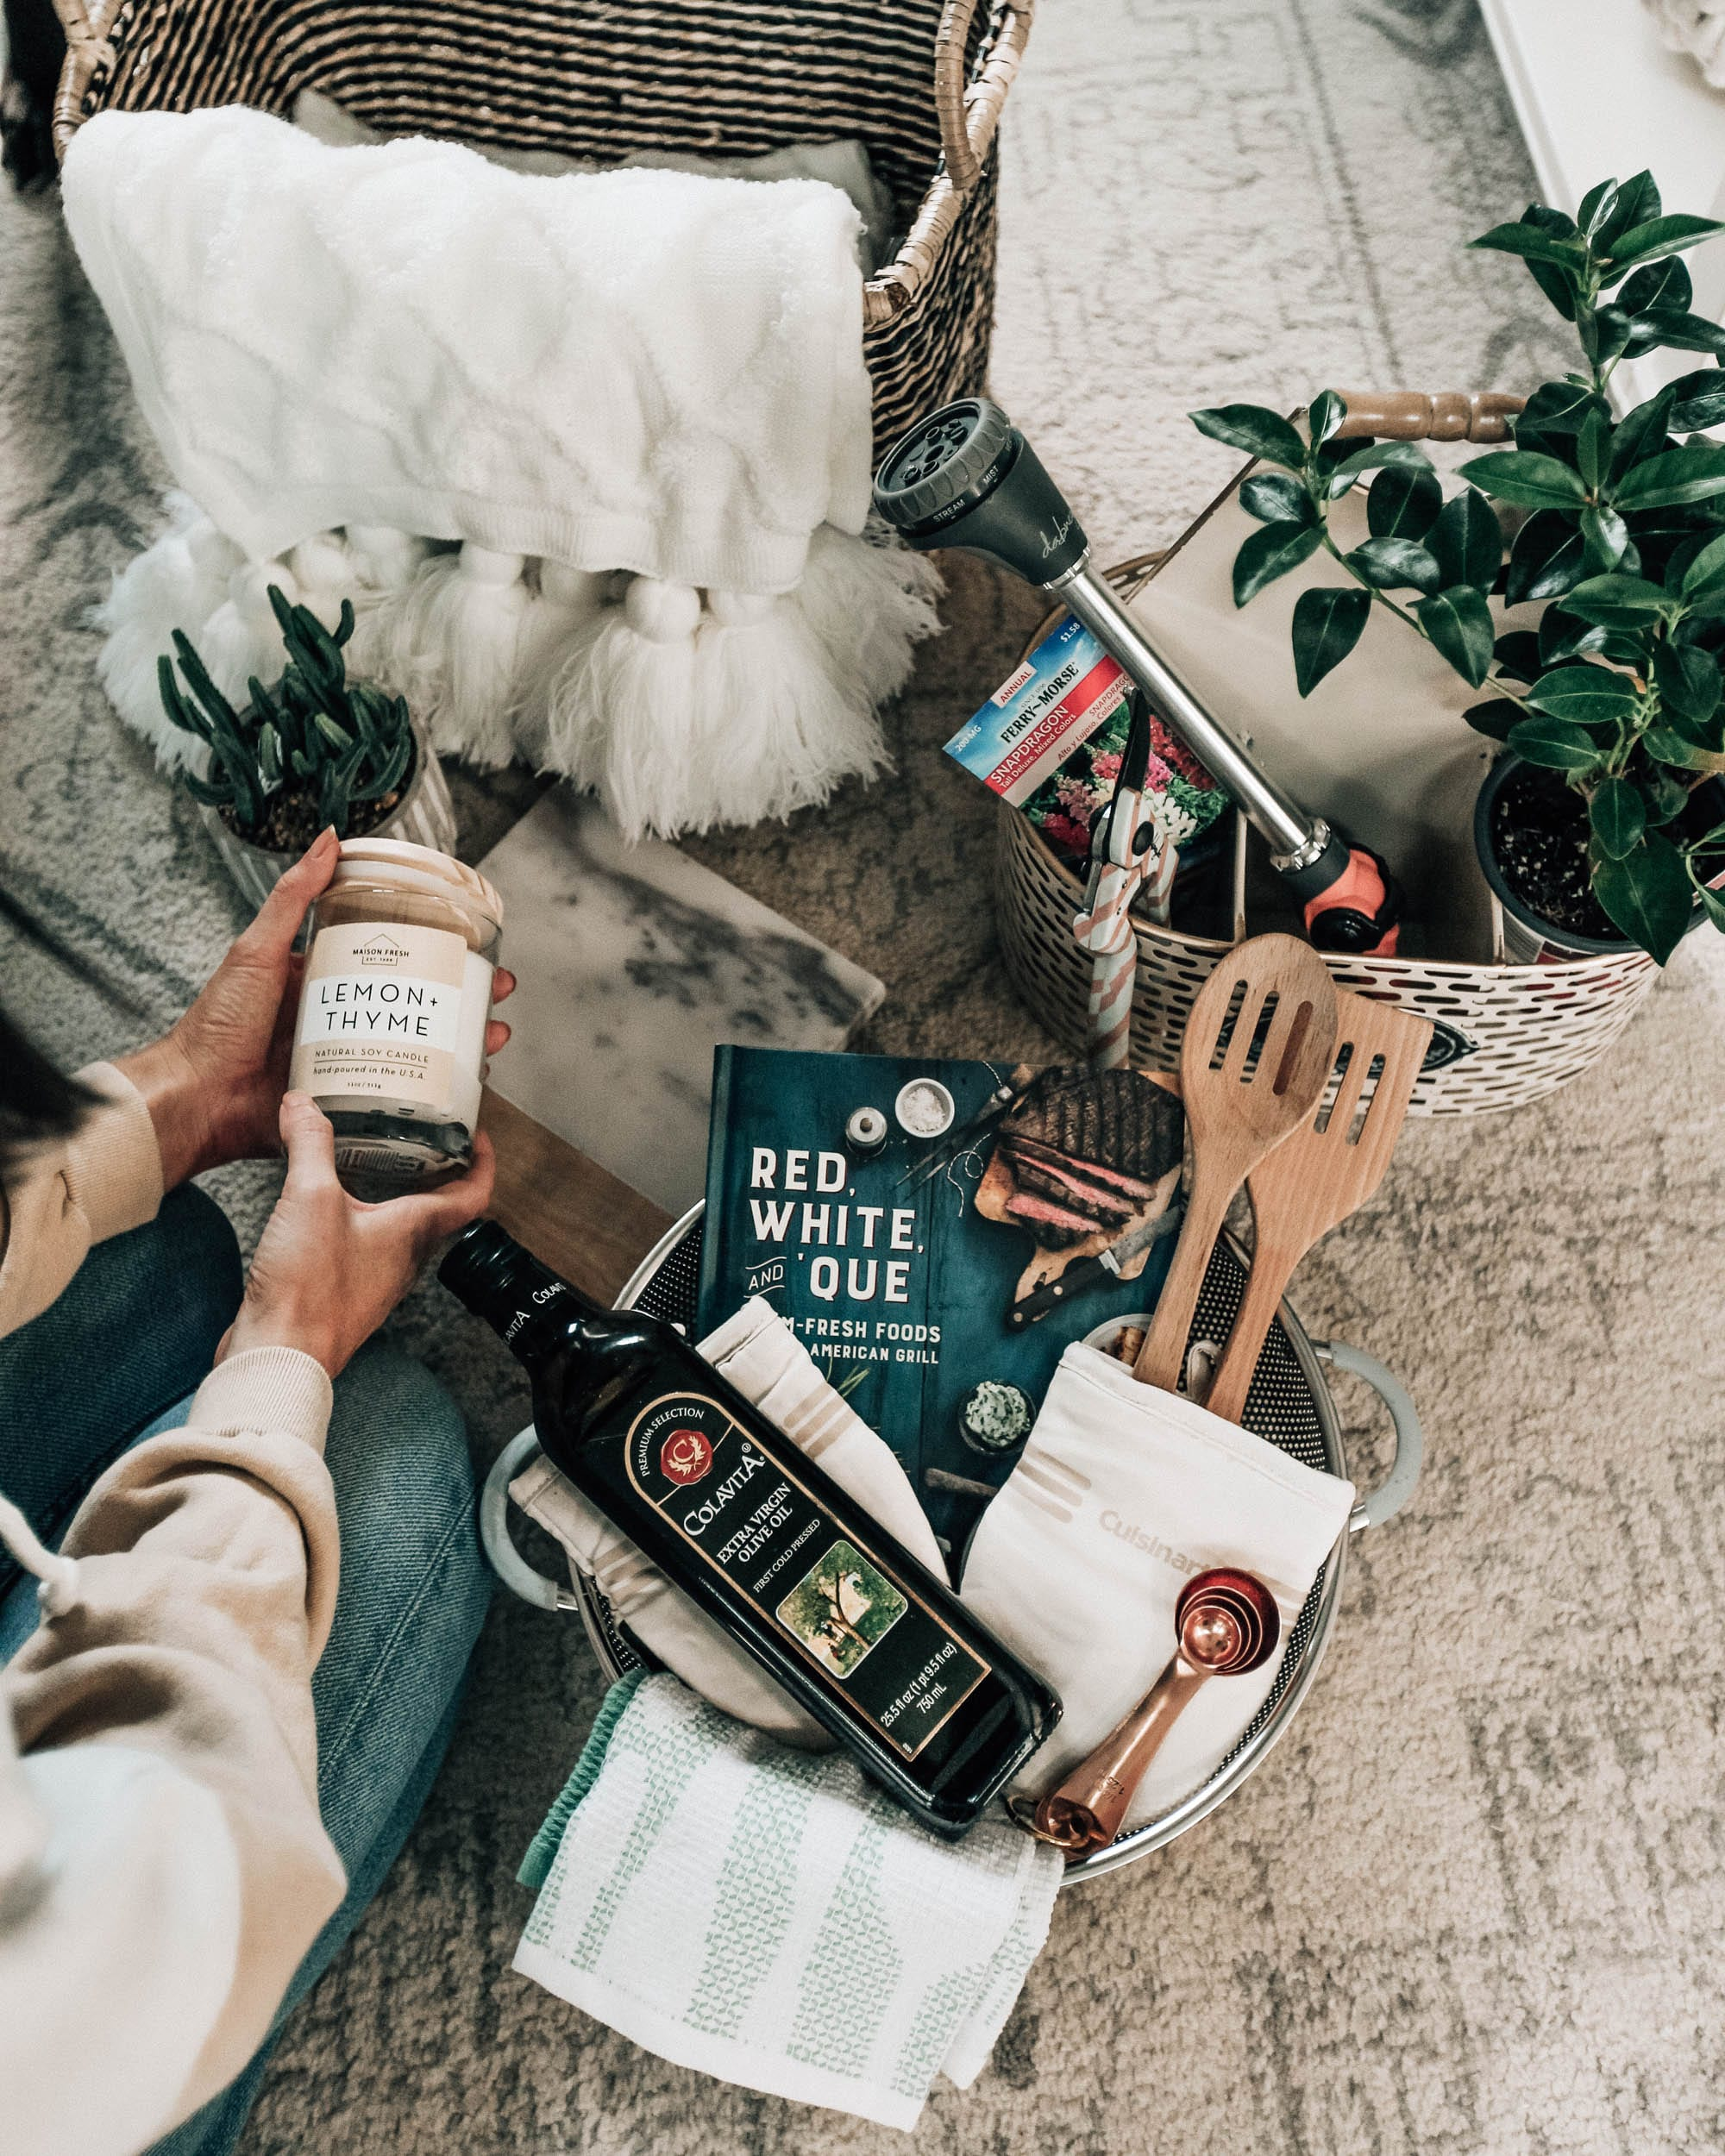 Housewarming Gift Basket Ideas - Pretty